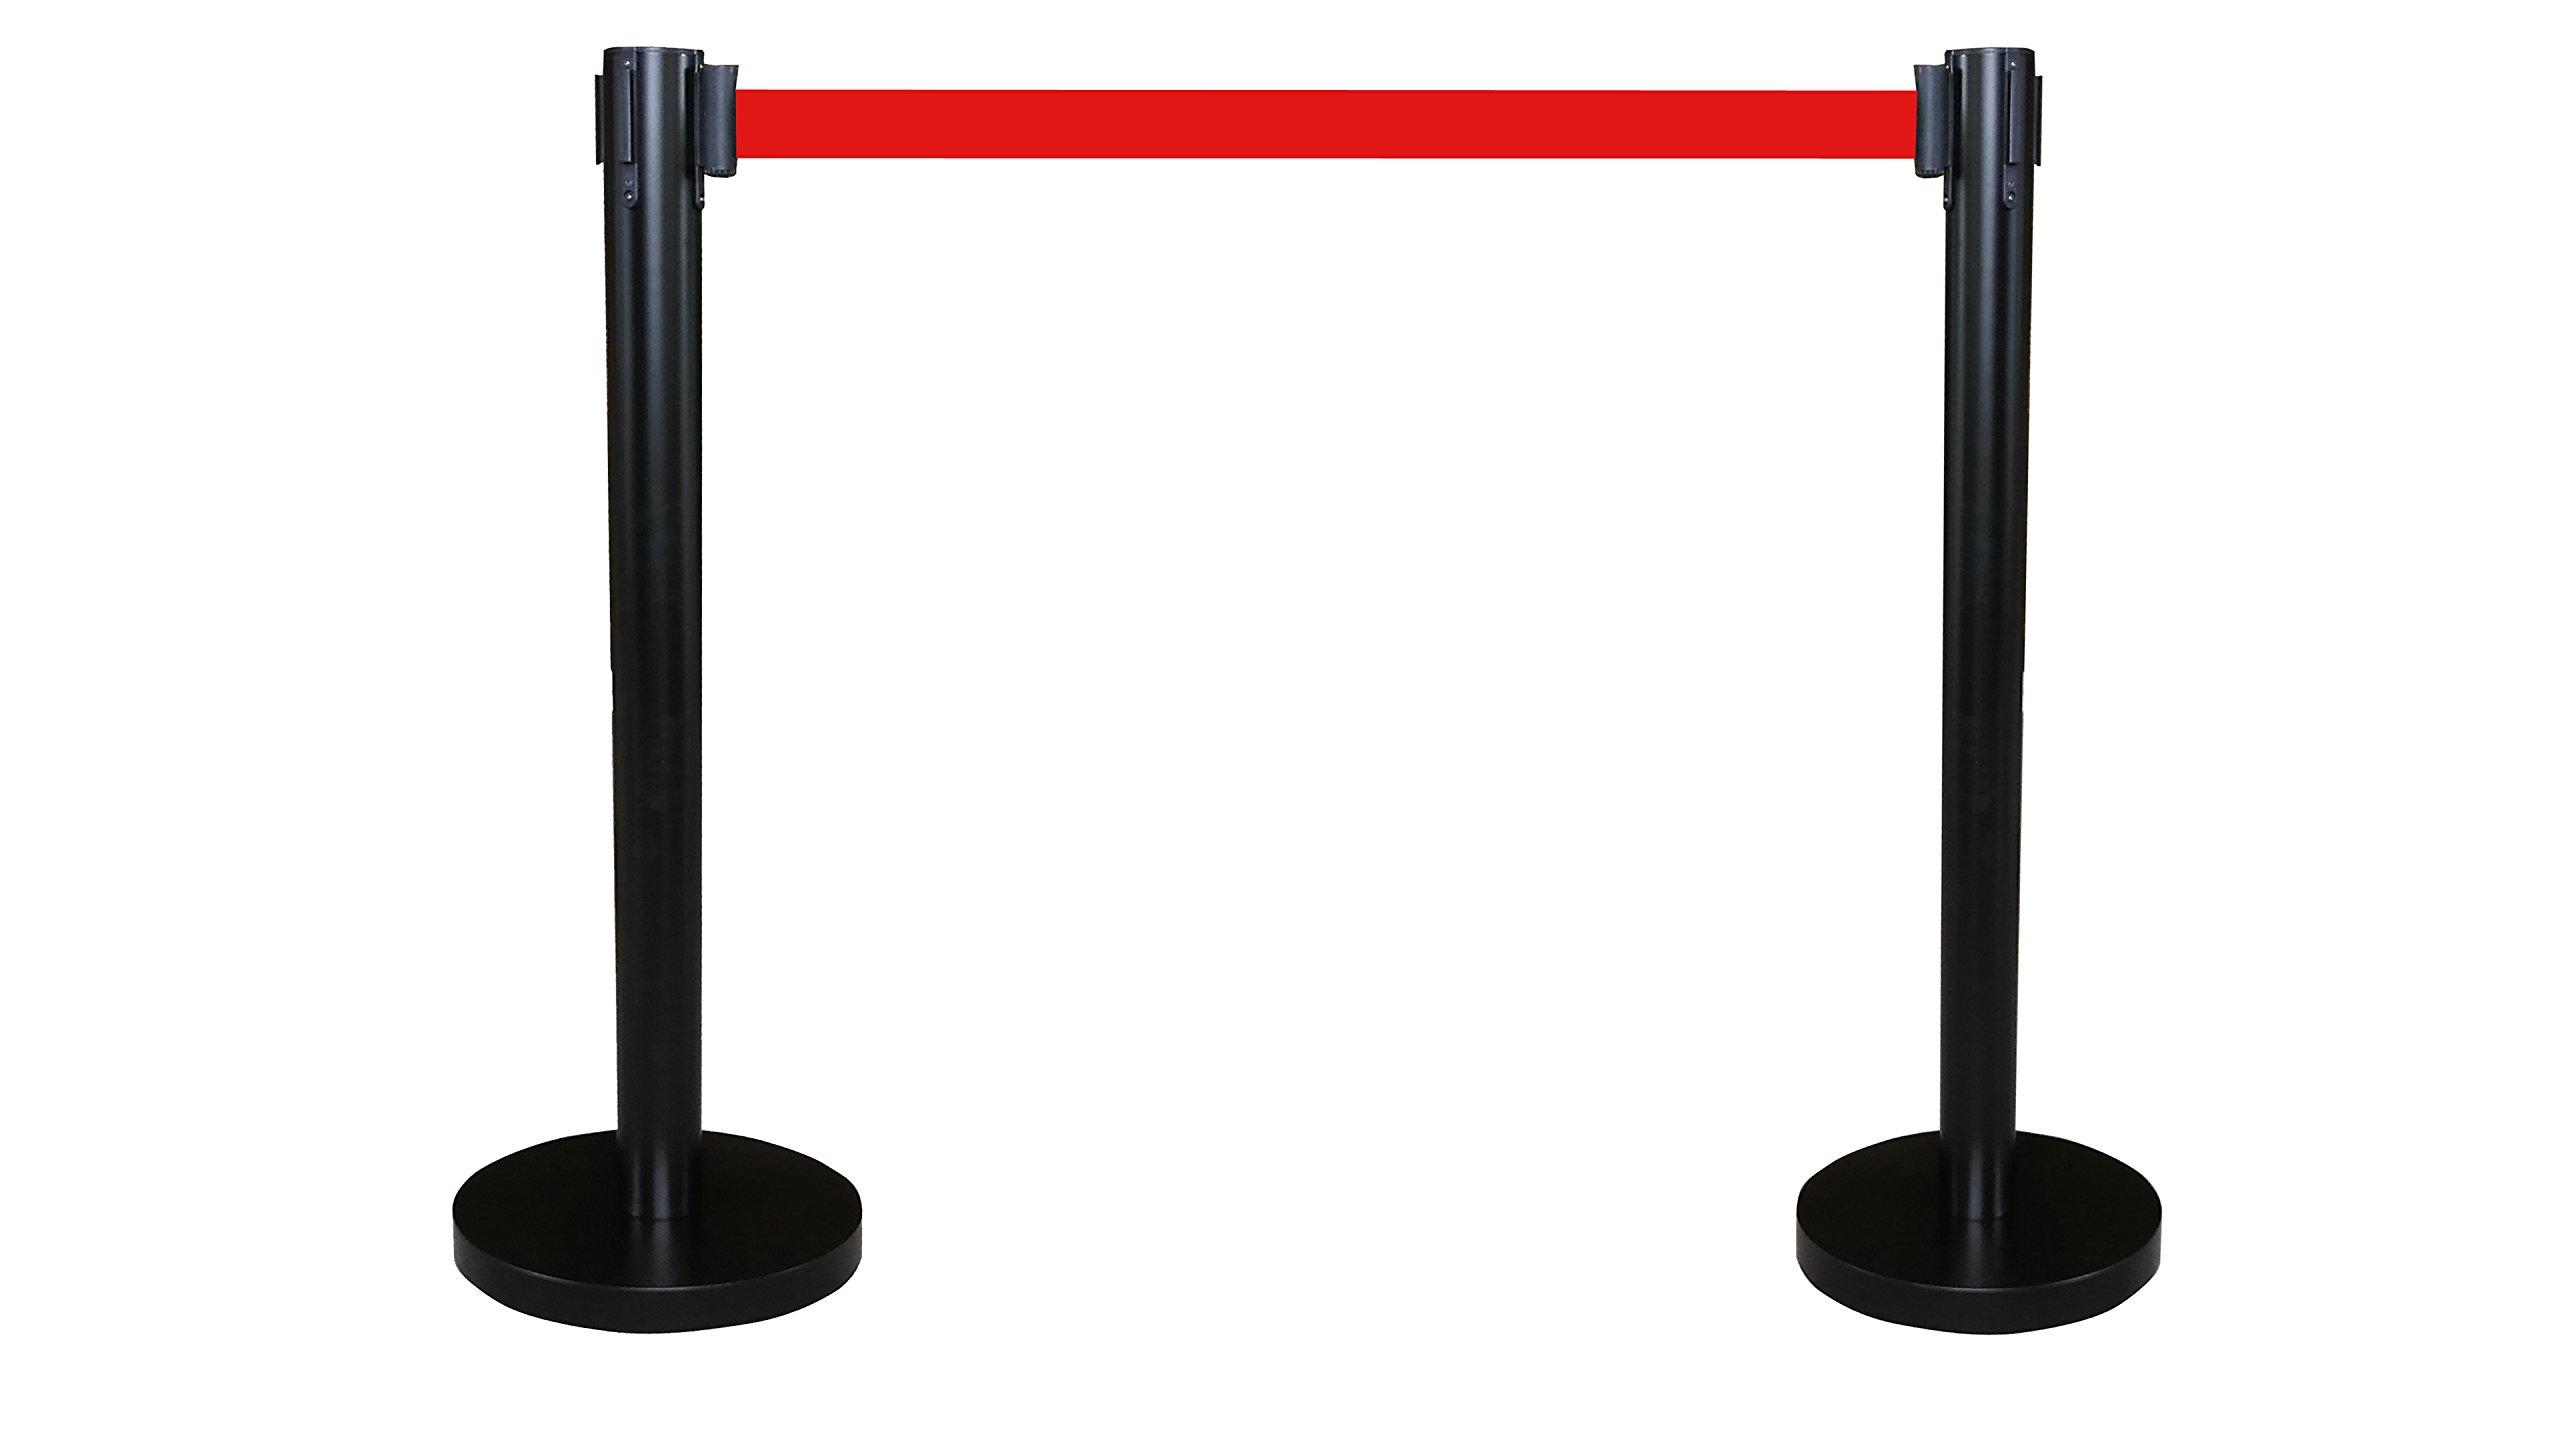 FixtureDisplays Black Crowd Control Stanchion Queue Barrier Post RED Strap 78'' Retractable 12004-10-2PK by FixtureDisplays